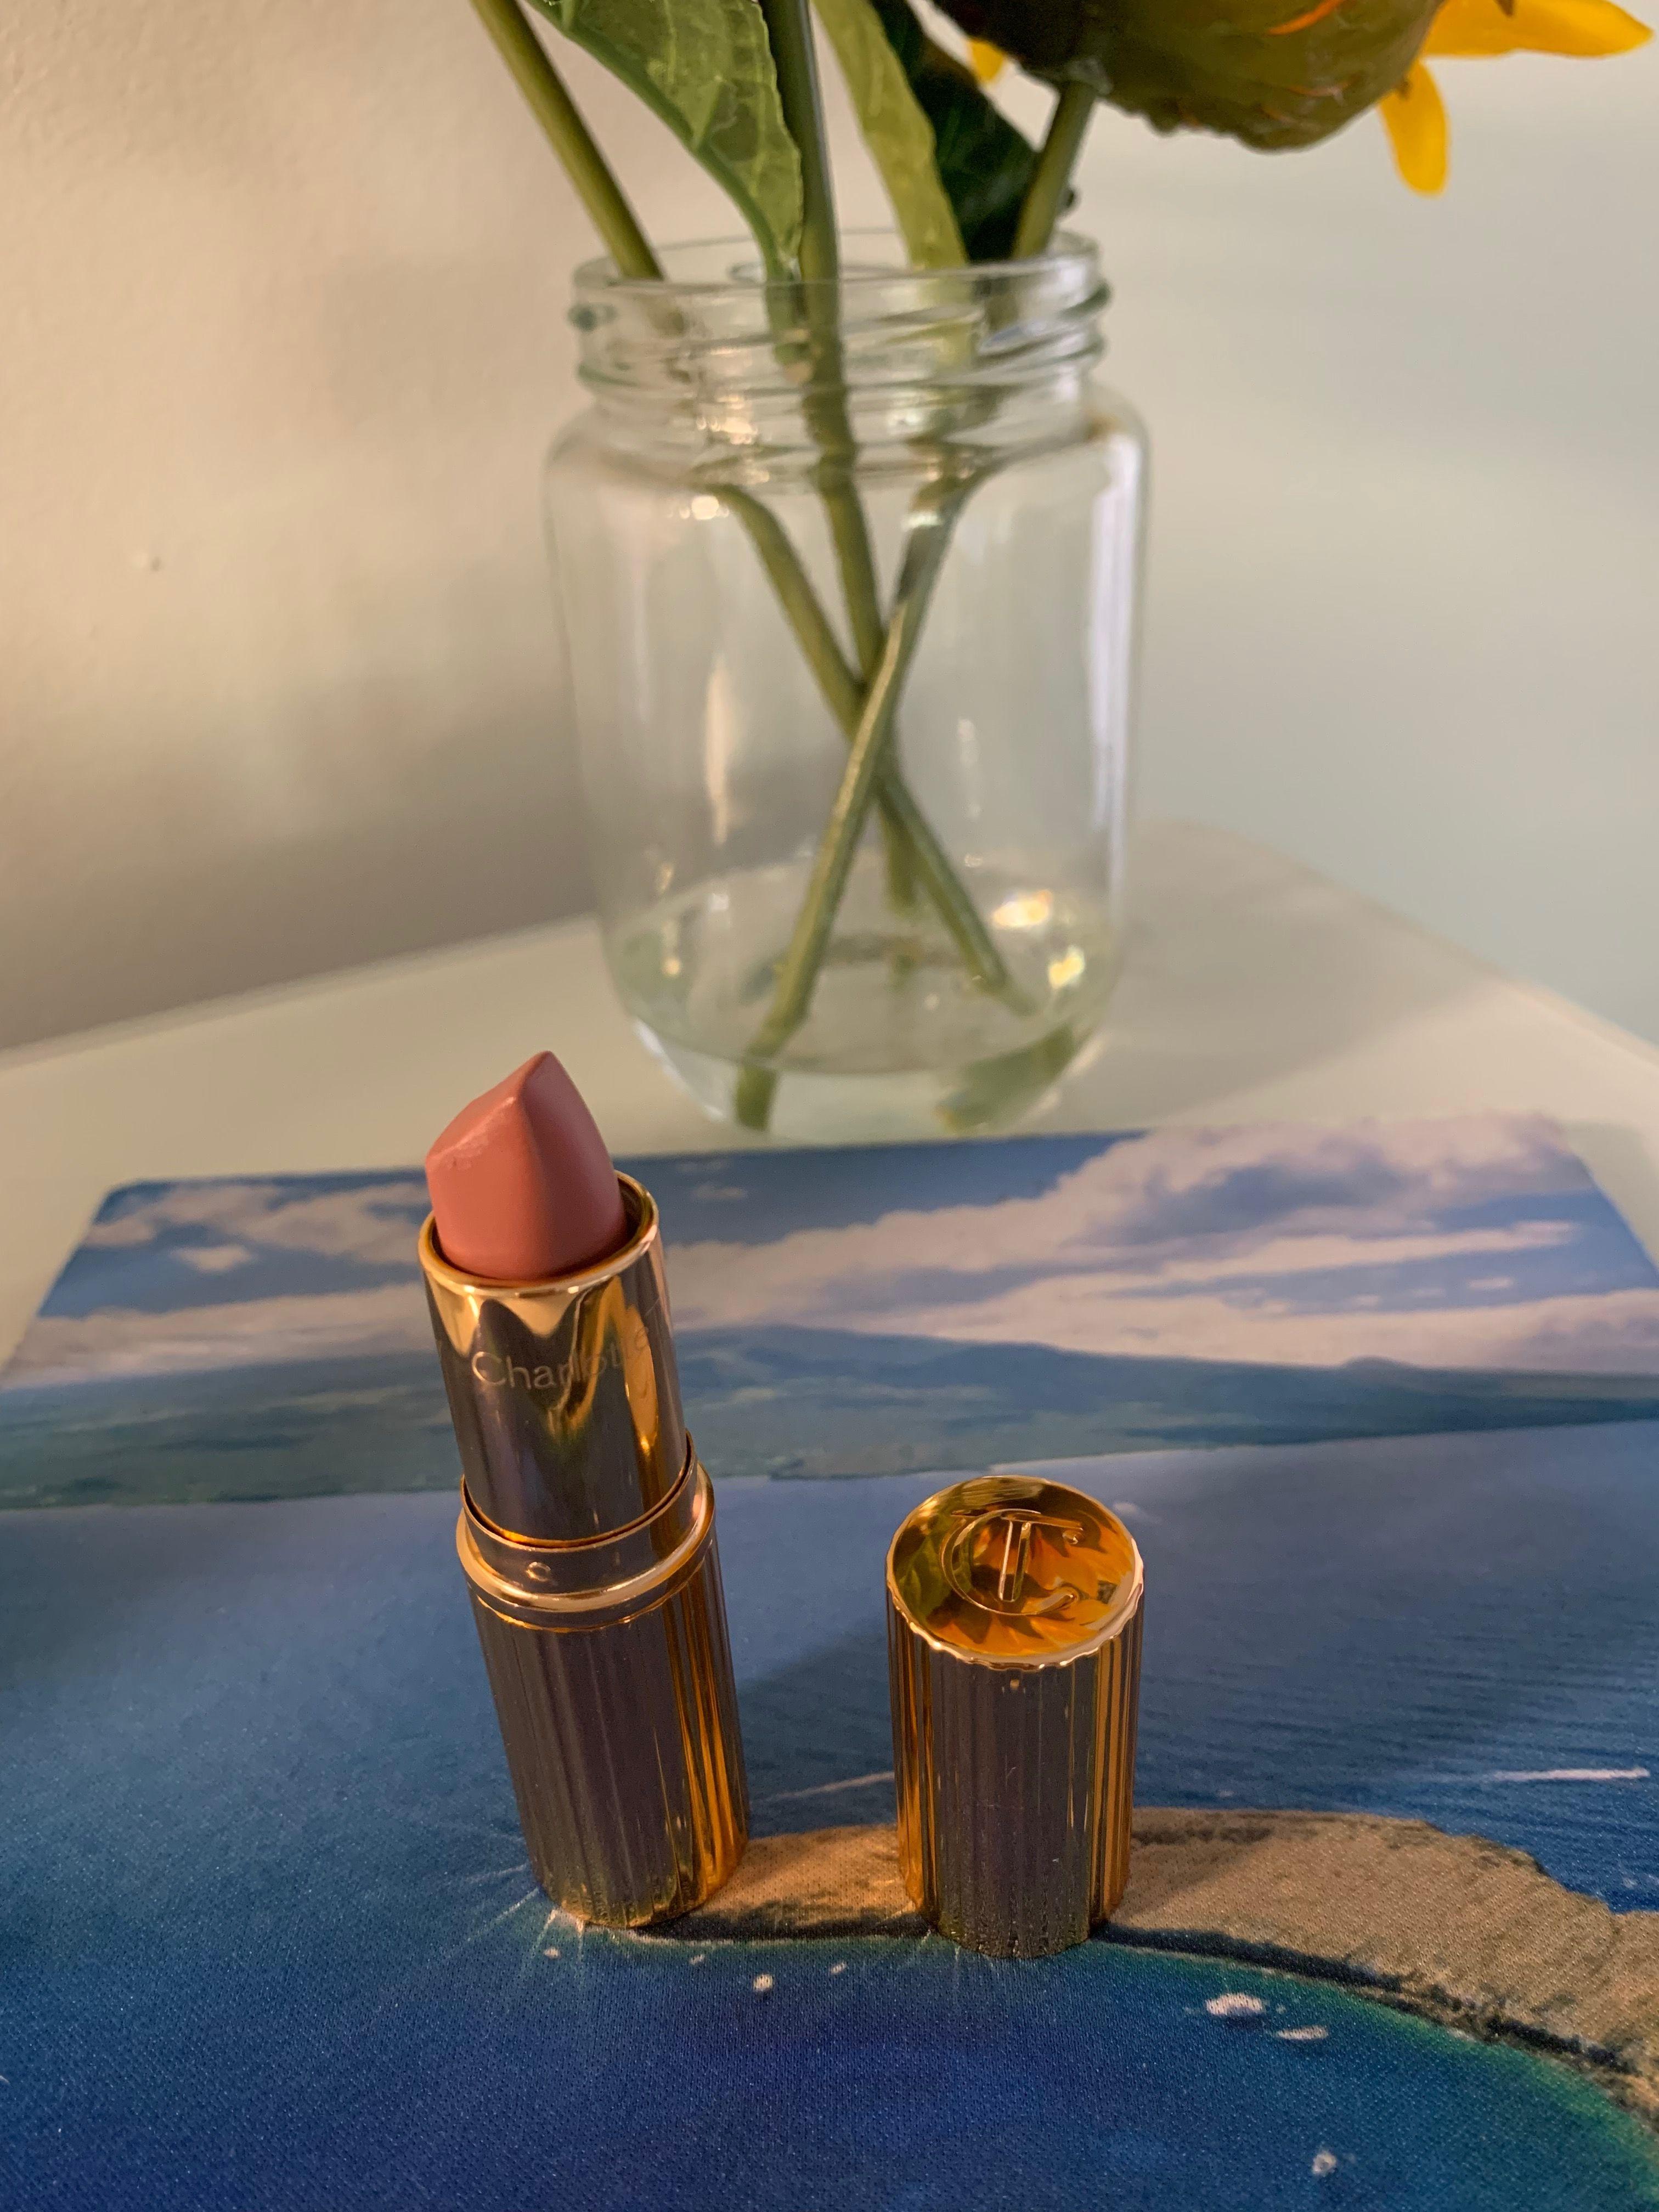 Pin on Makeup & Nails